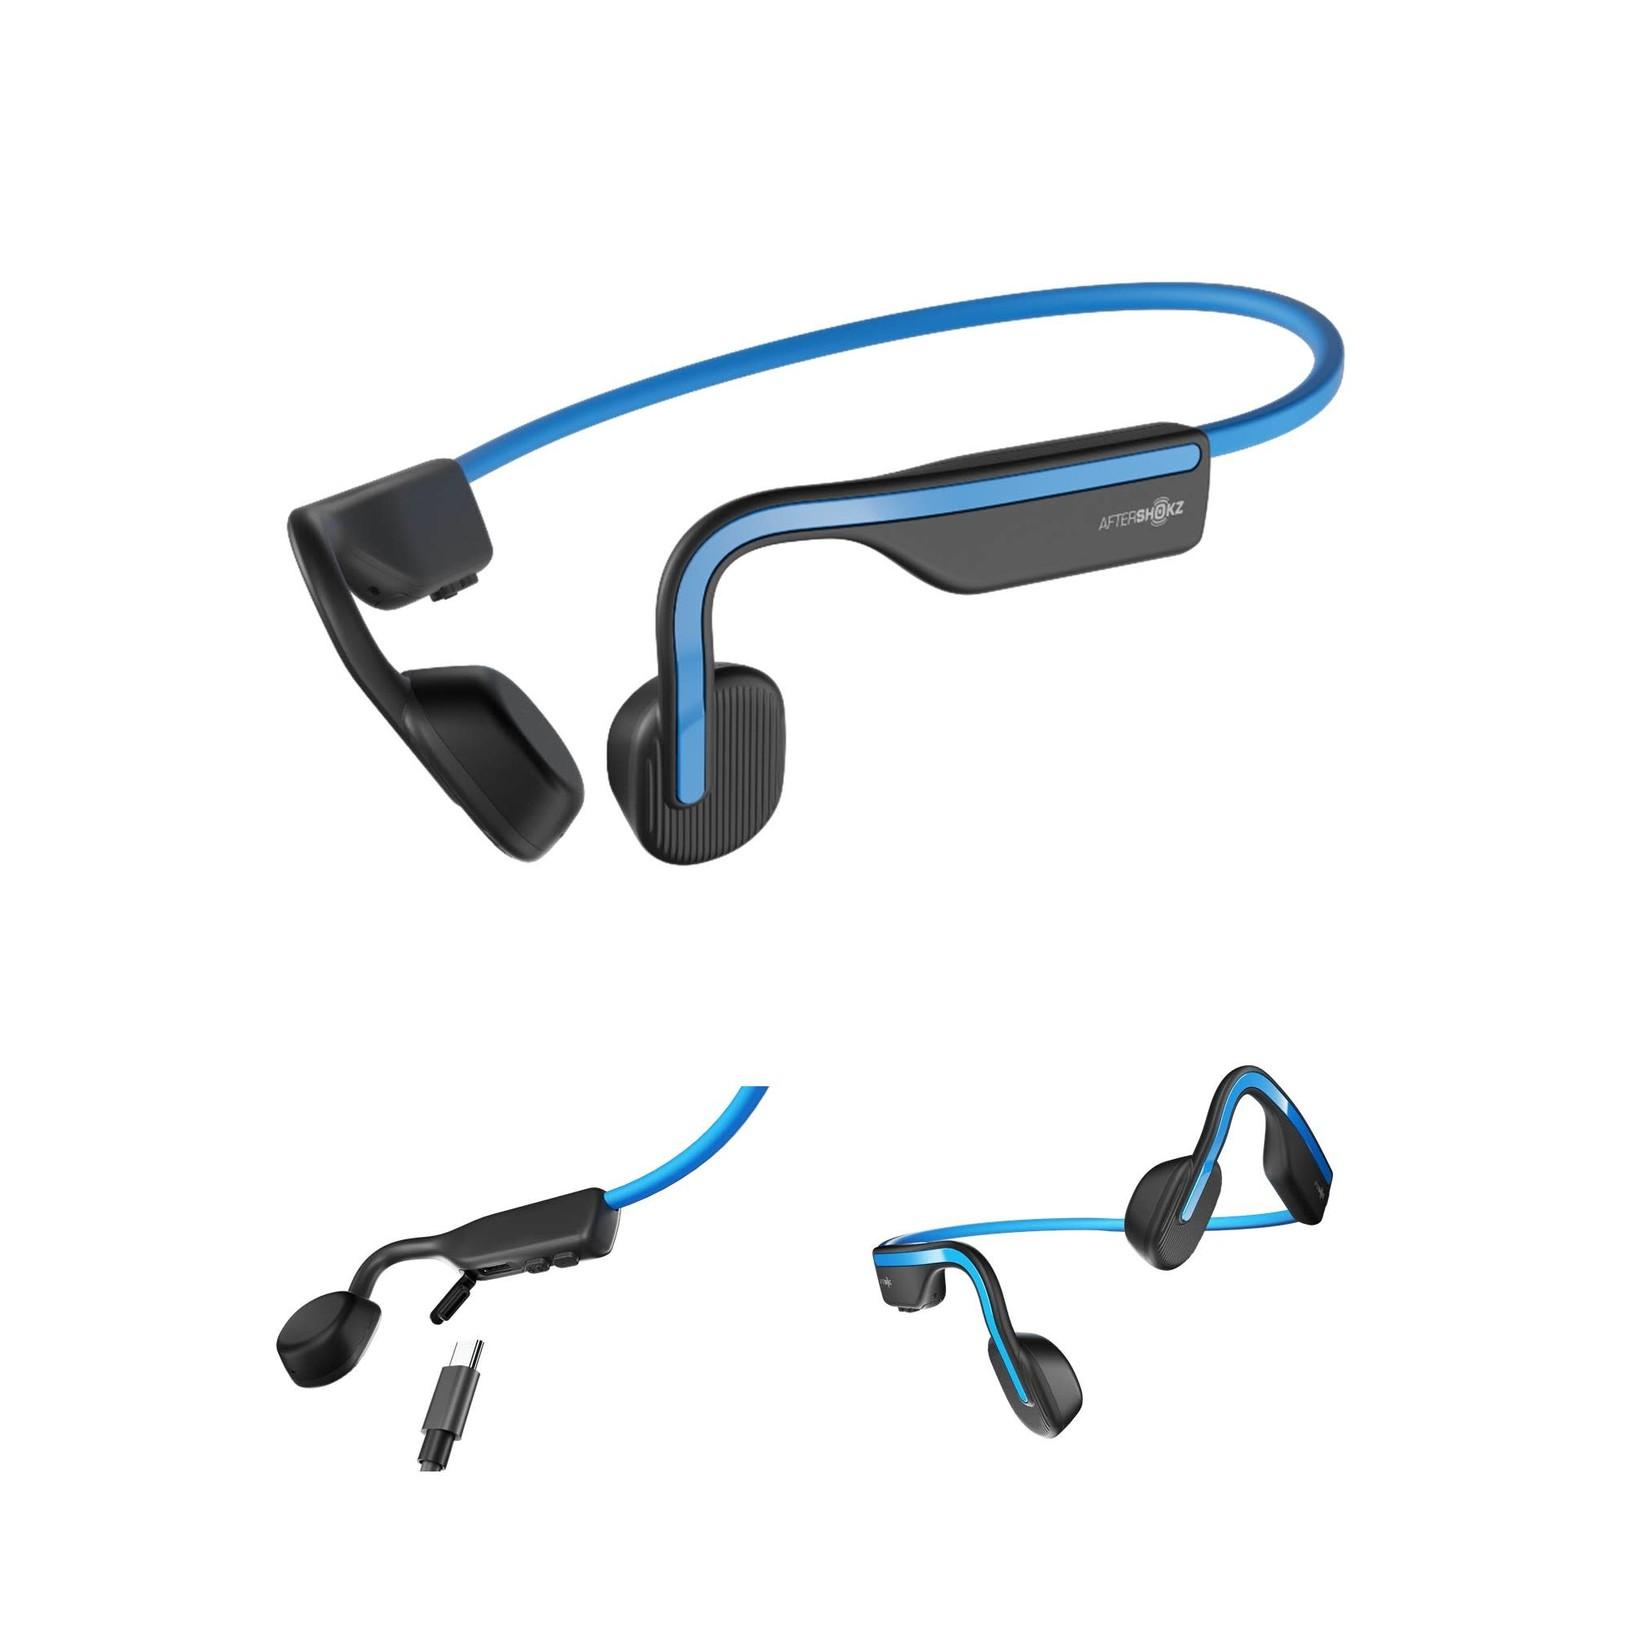 Aftershokz Openmove Wireless Bluetooth Headphones Elevation Blue